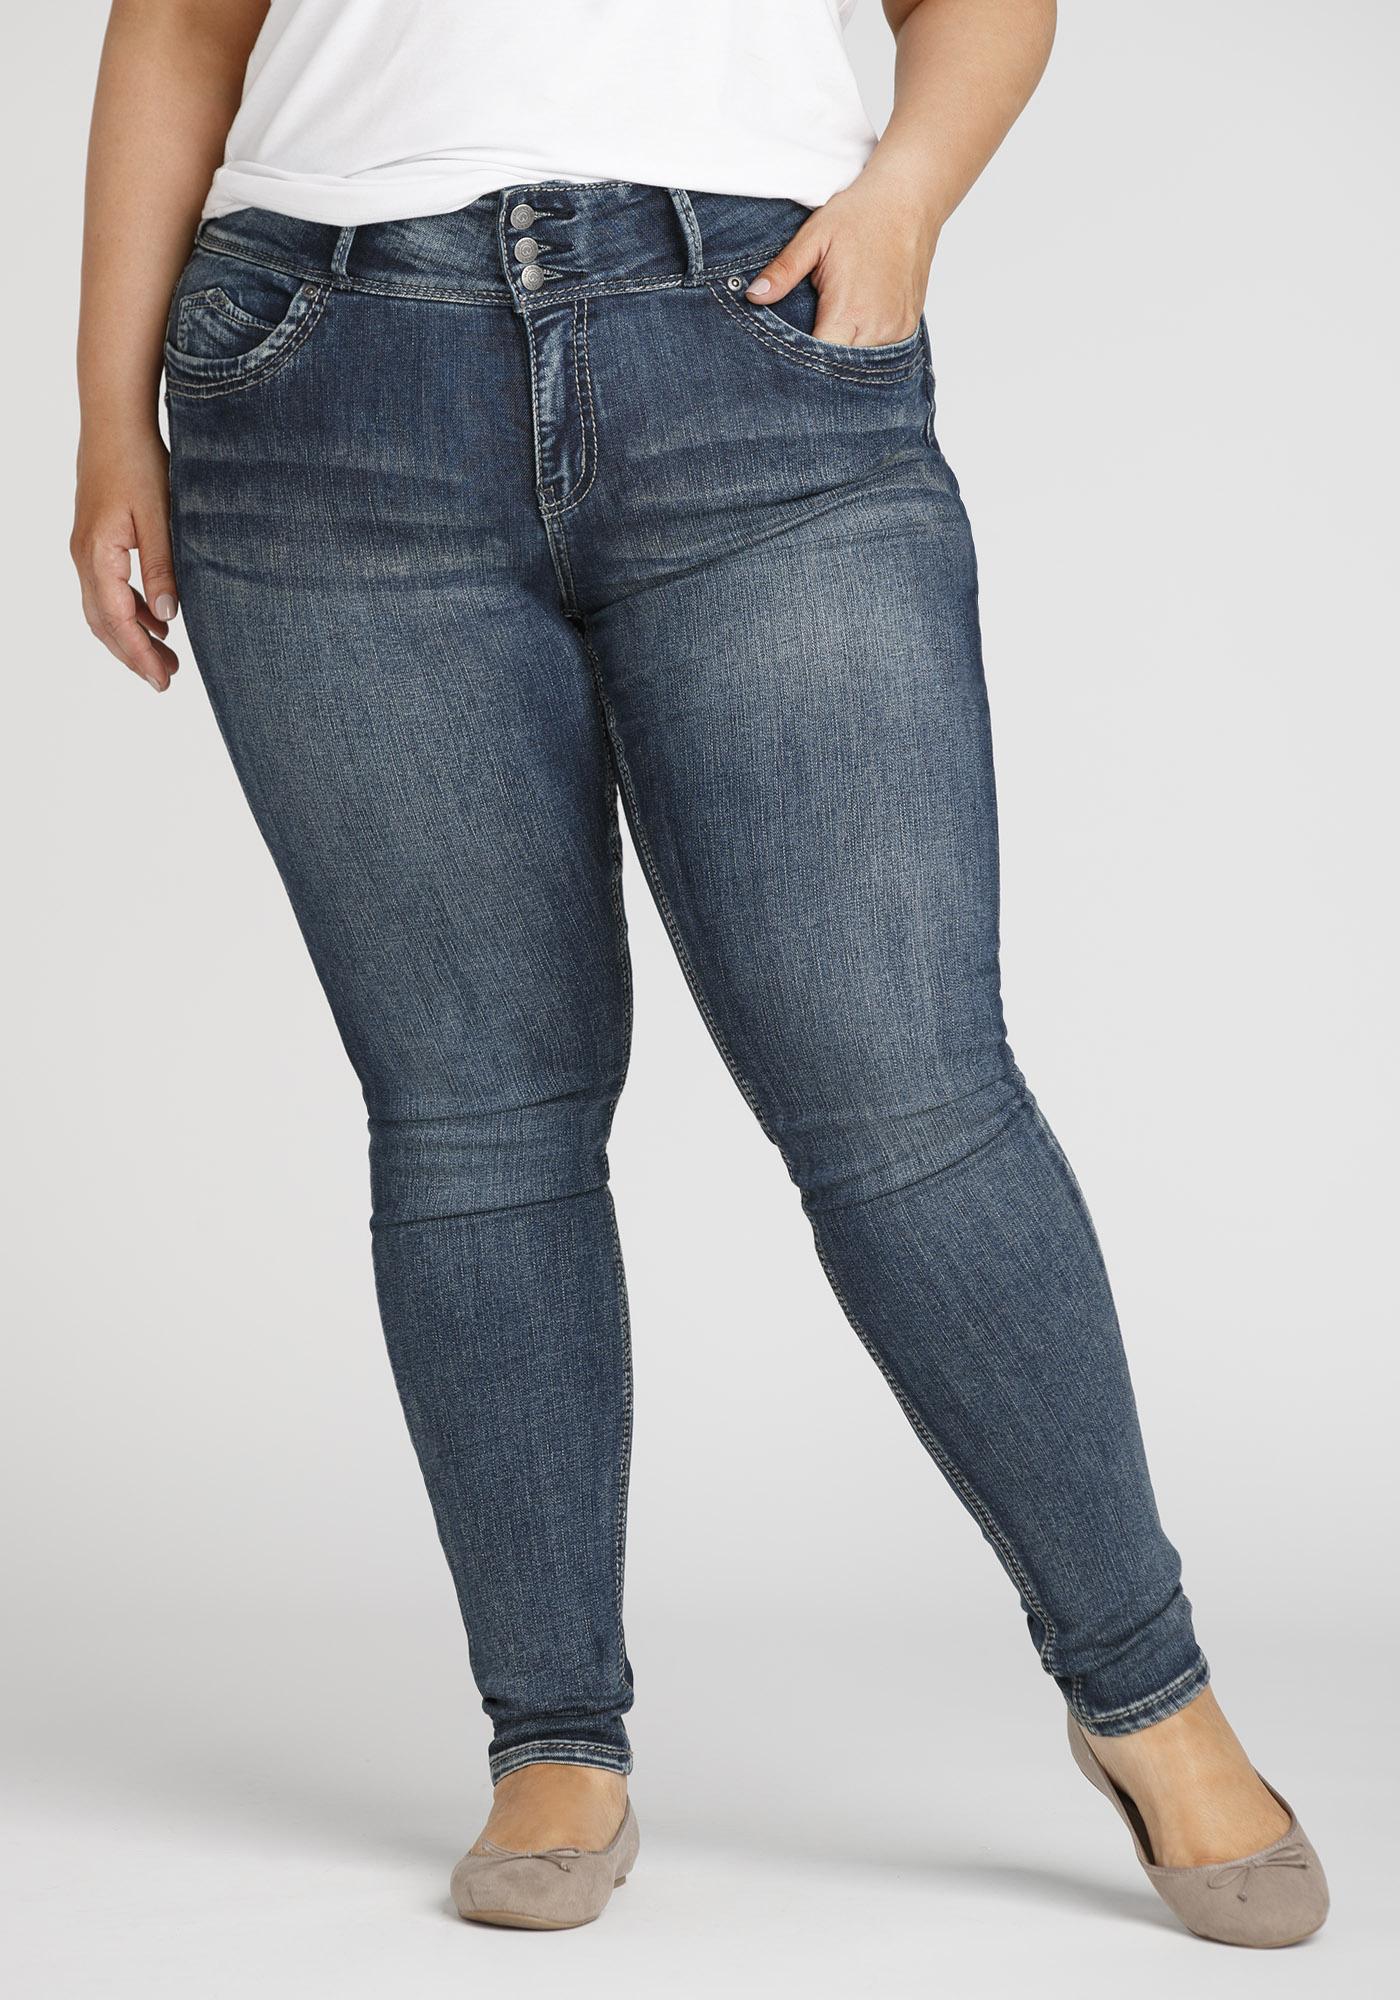 d913da2e7f61f Women's Plus Size Stacked Button Skinny Jeans, MEDIUM WASH, hi-res